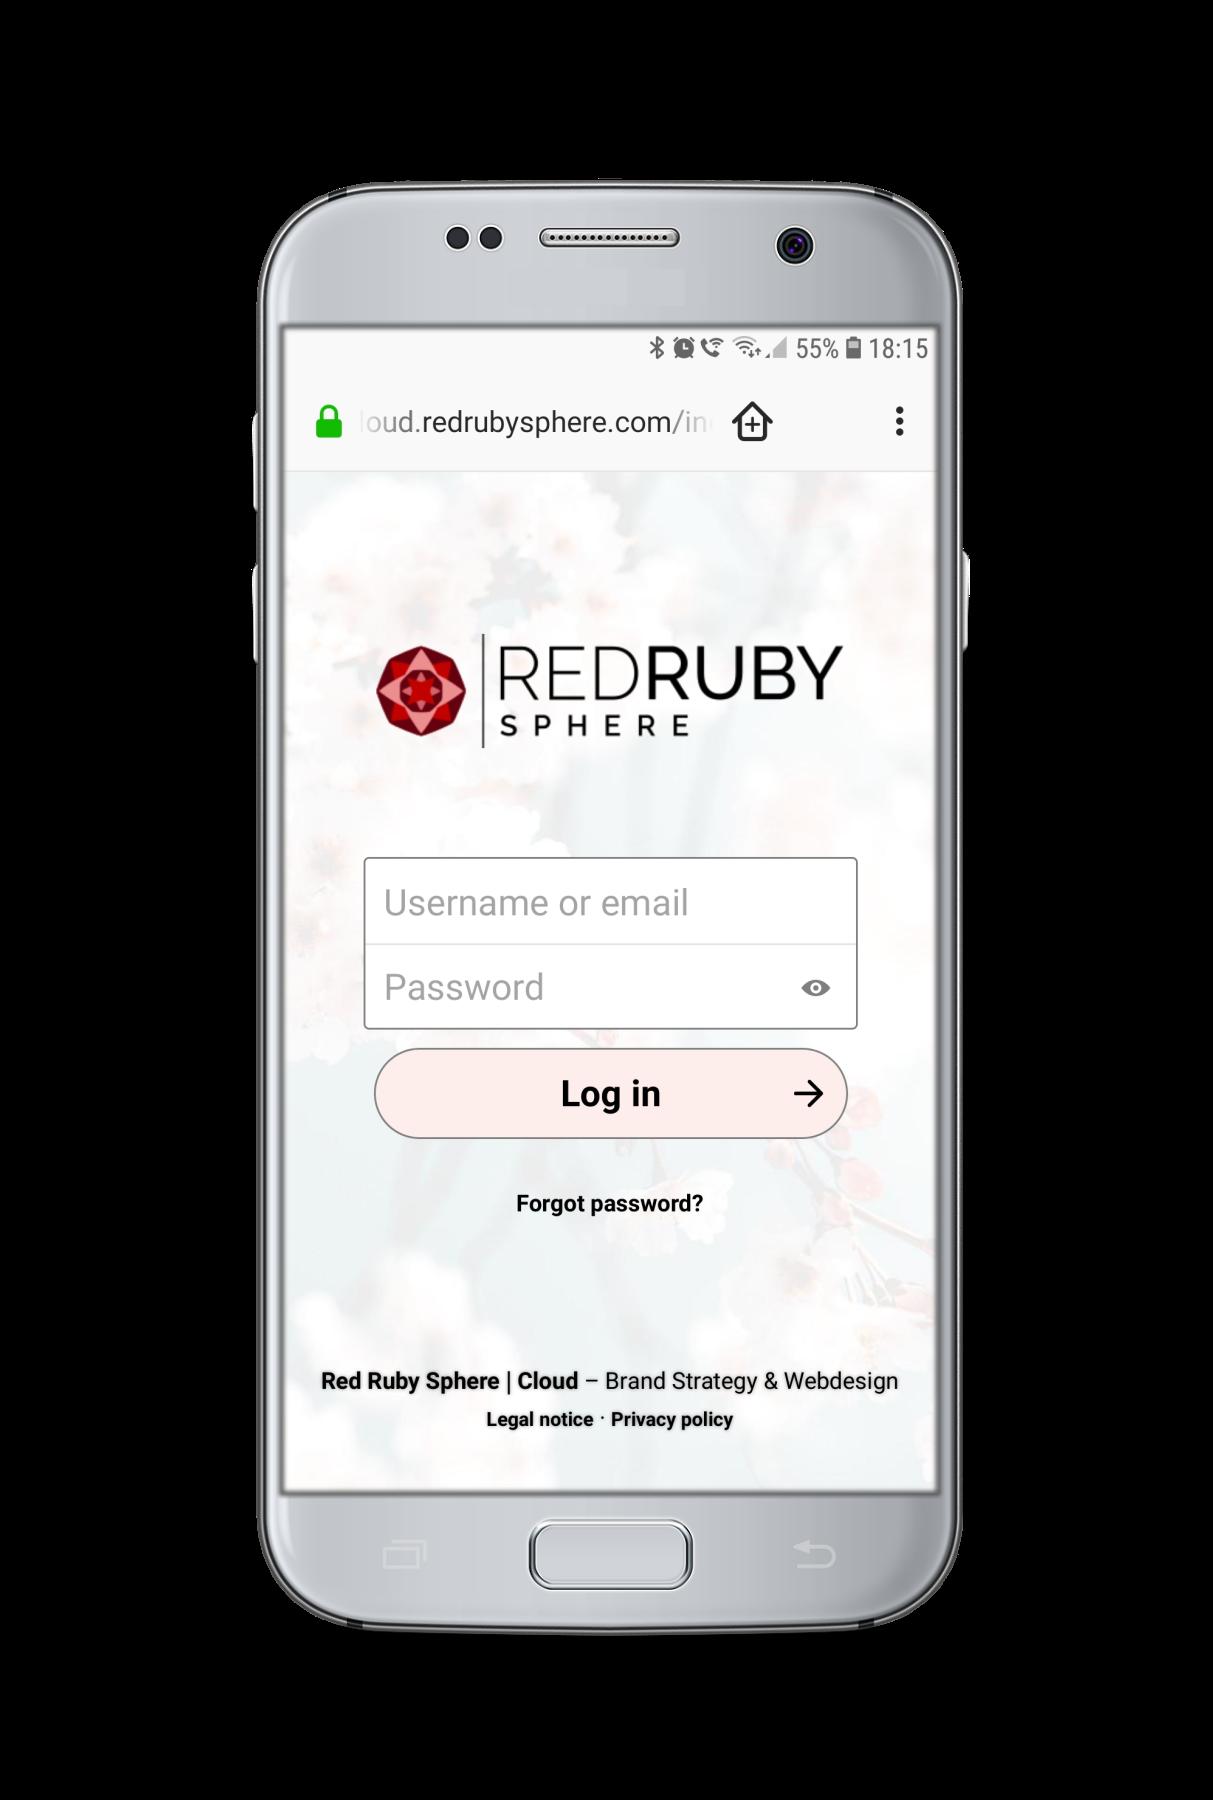 Red Ruby Sphere - Cloud Platform Service